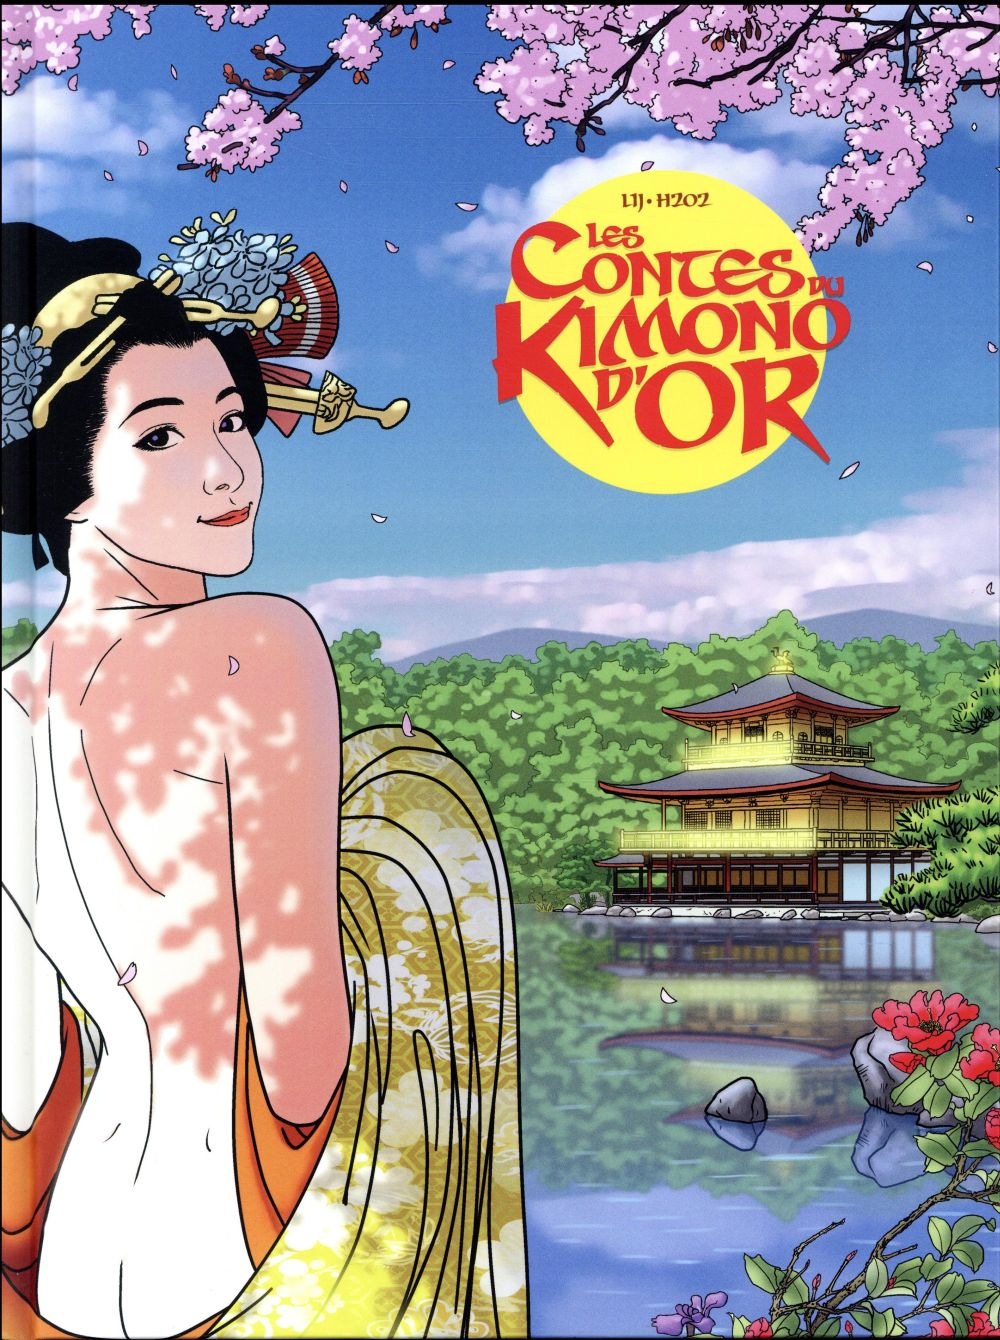 Les contes du kimono d'or